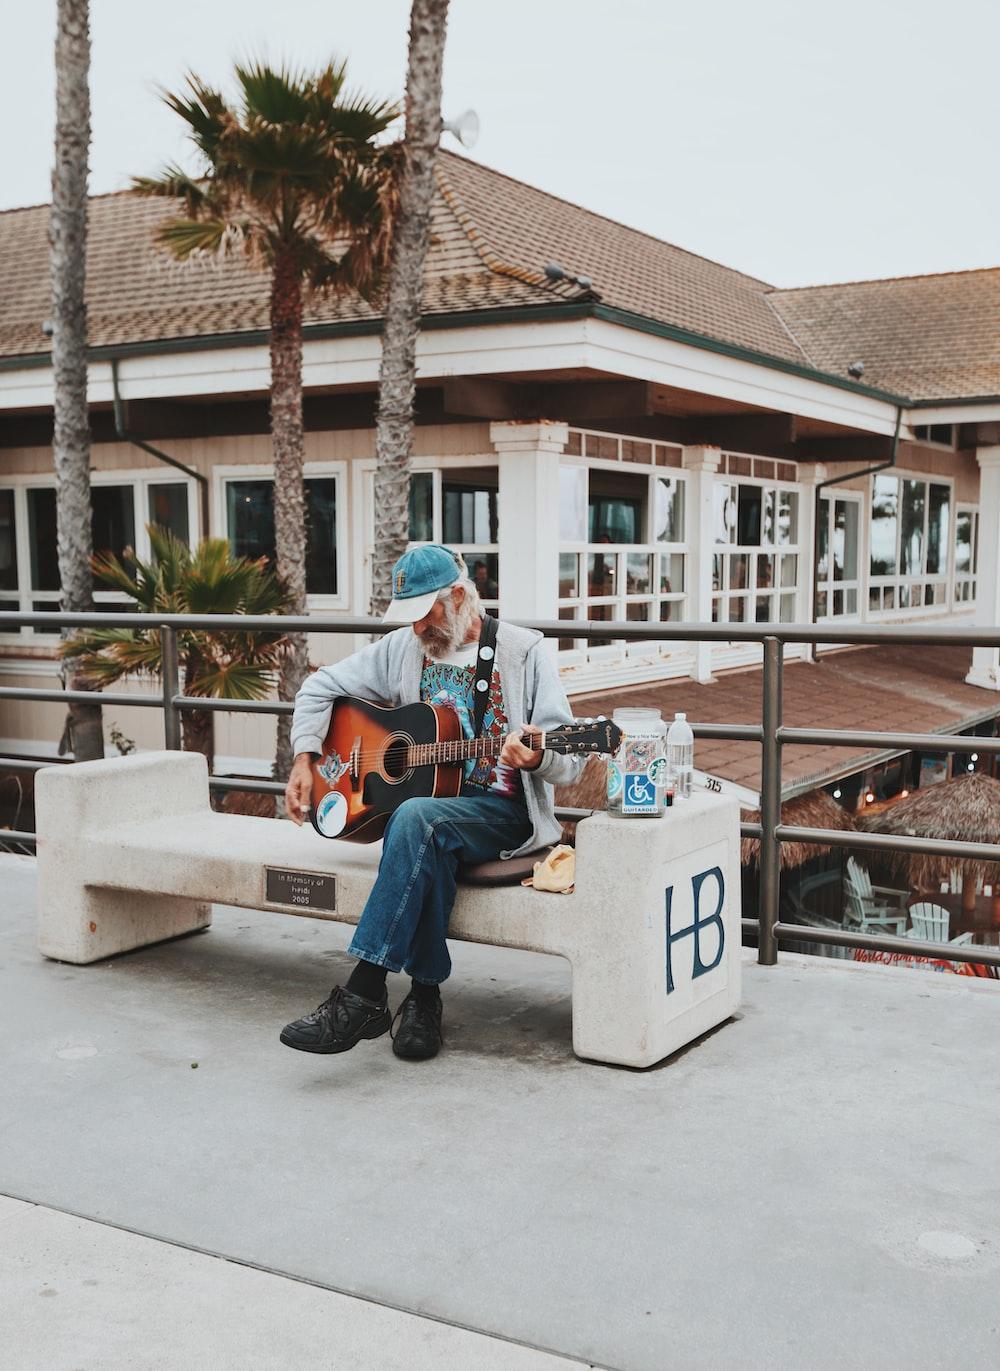 man sitting on outdoor bench playing guitar during daytime